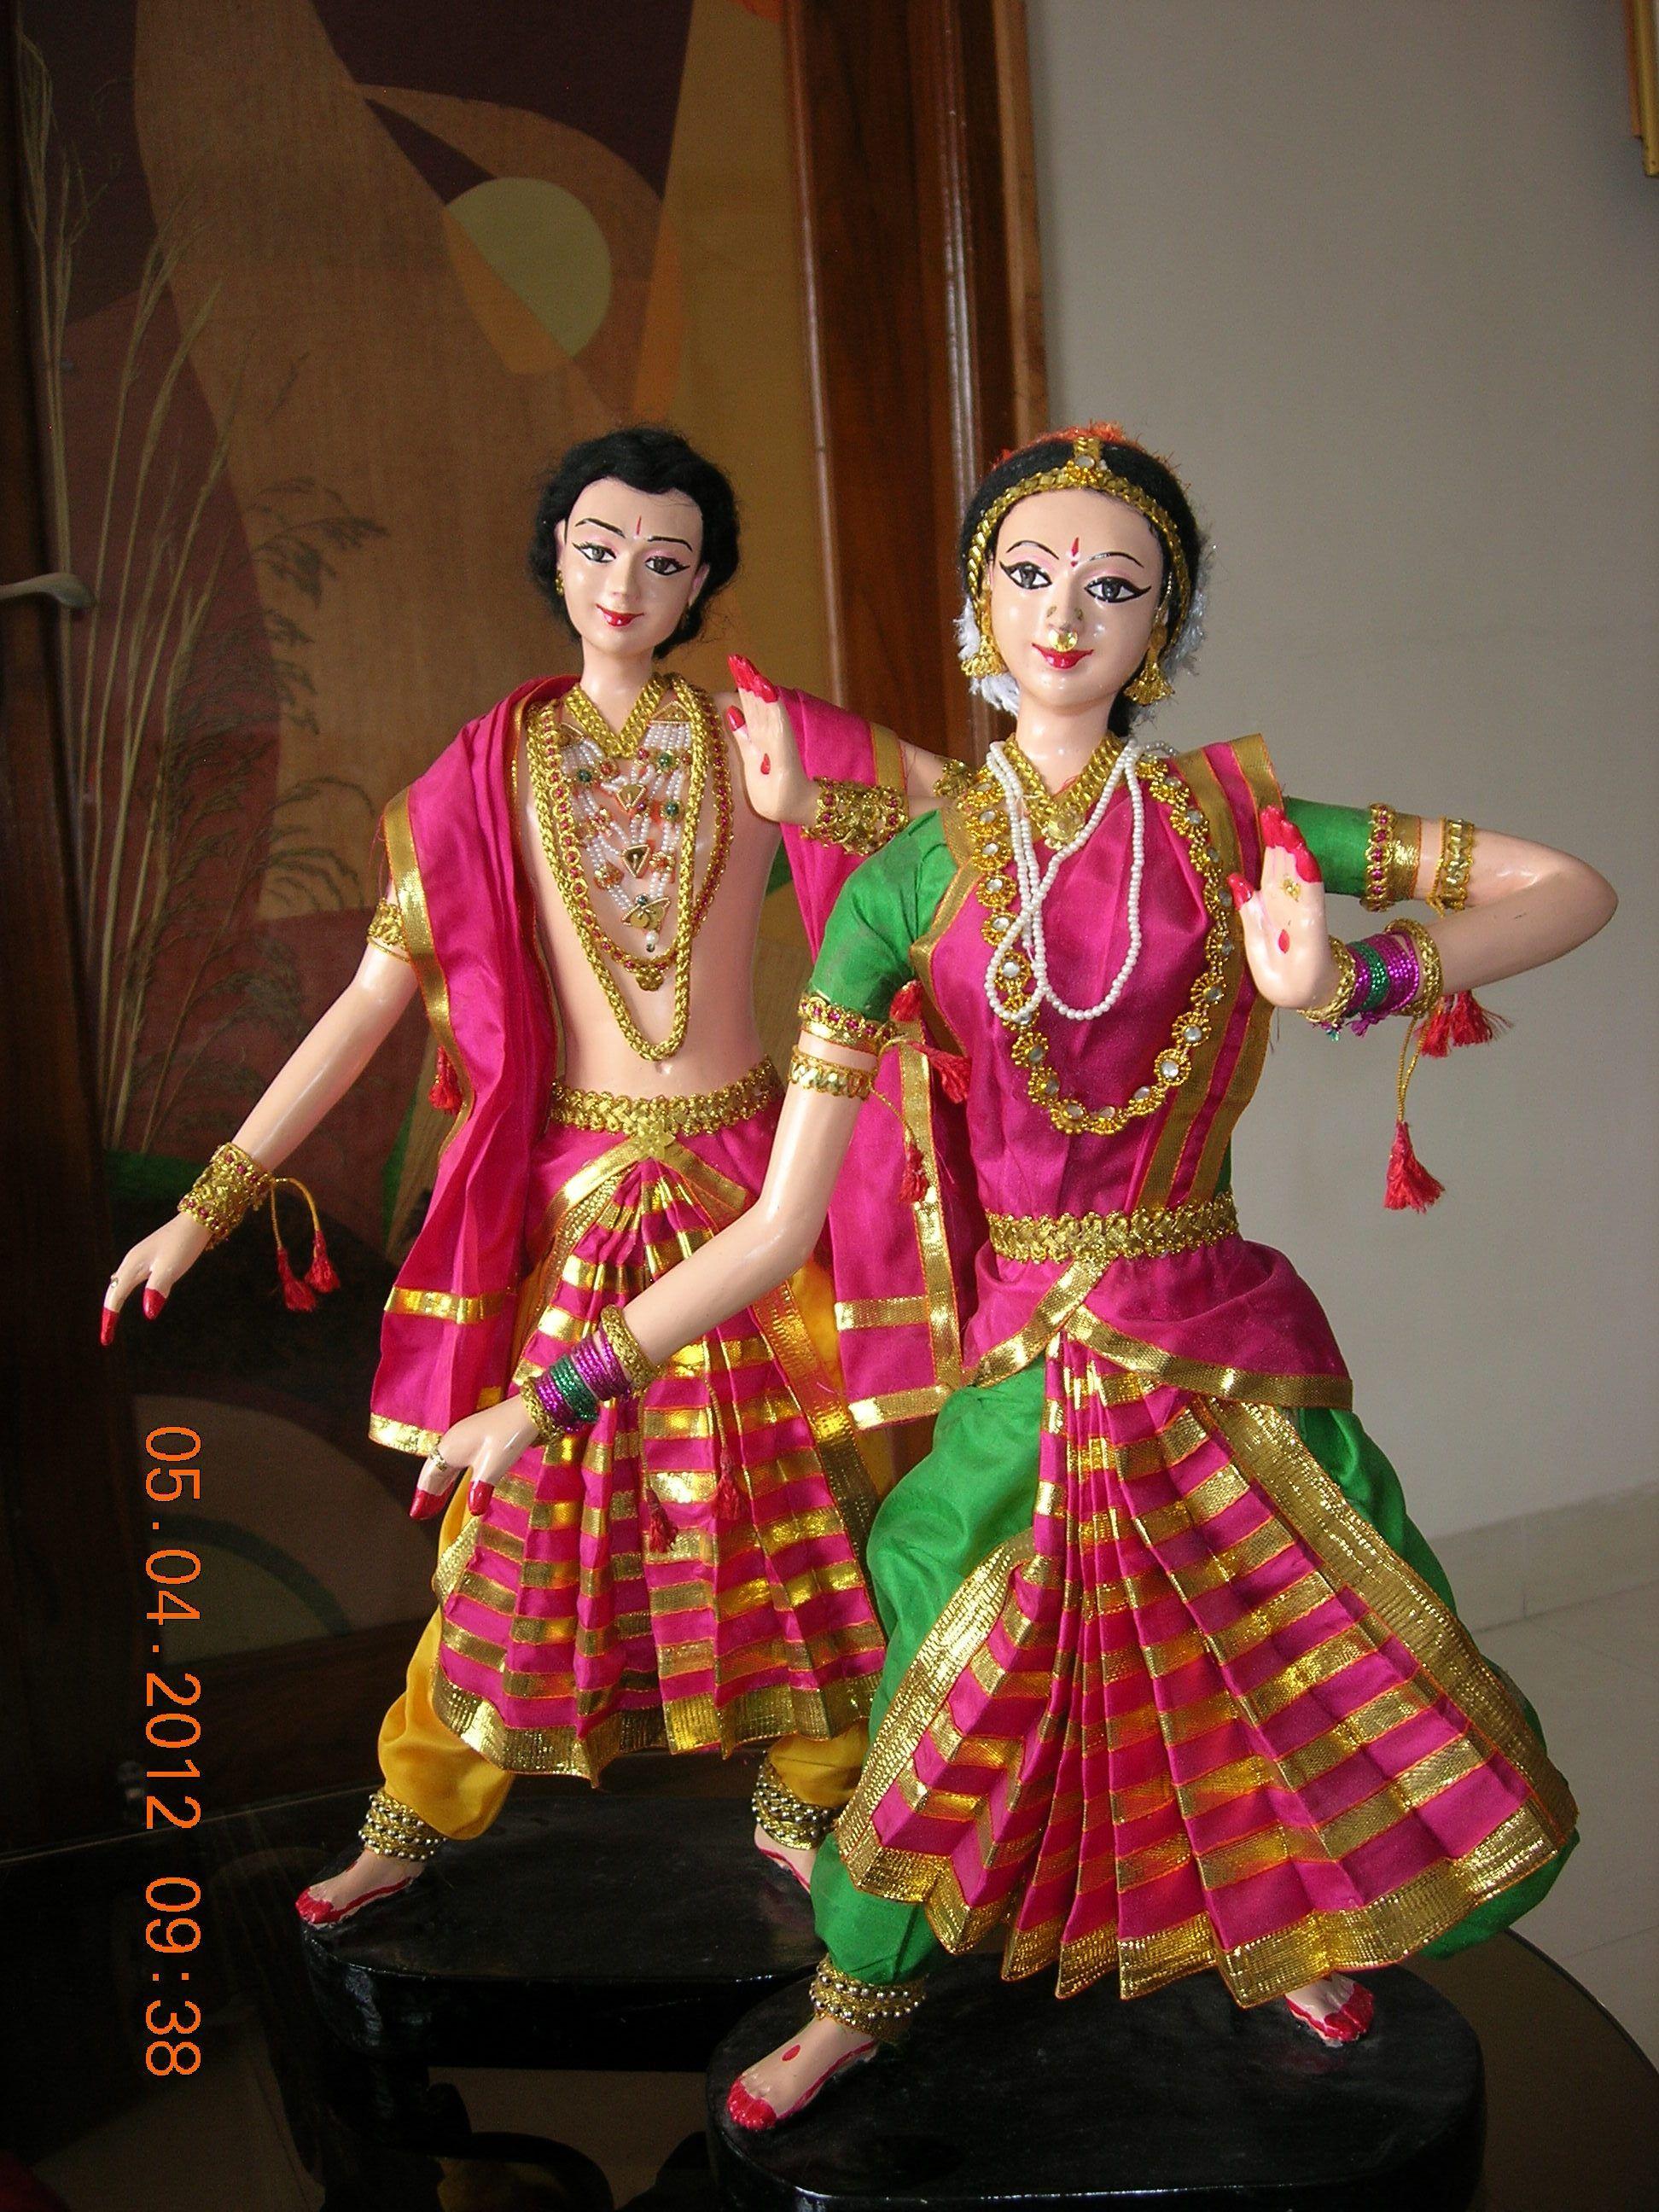 Dance of india dolls indian dolls wedding doll dance